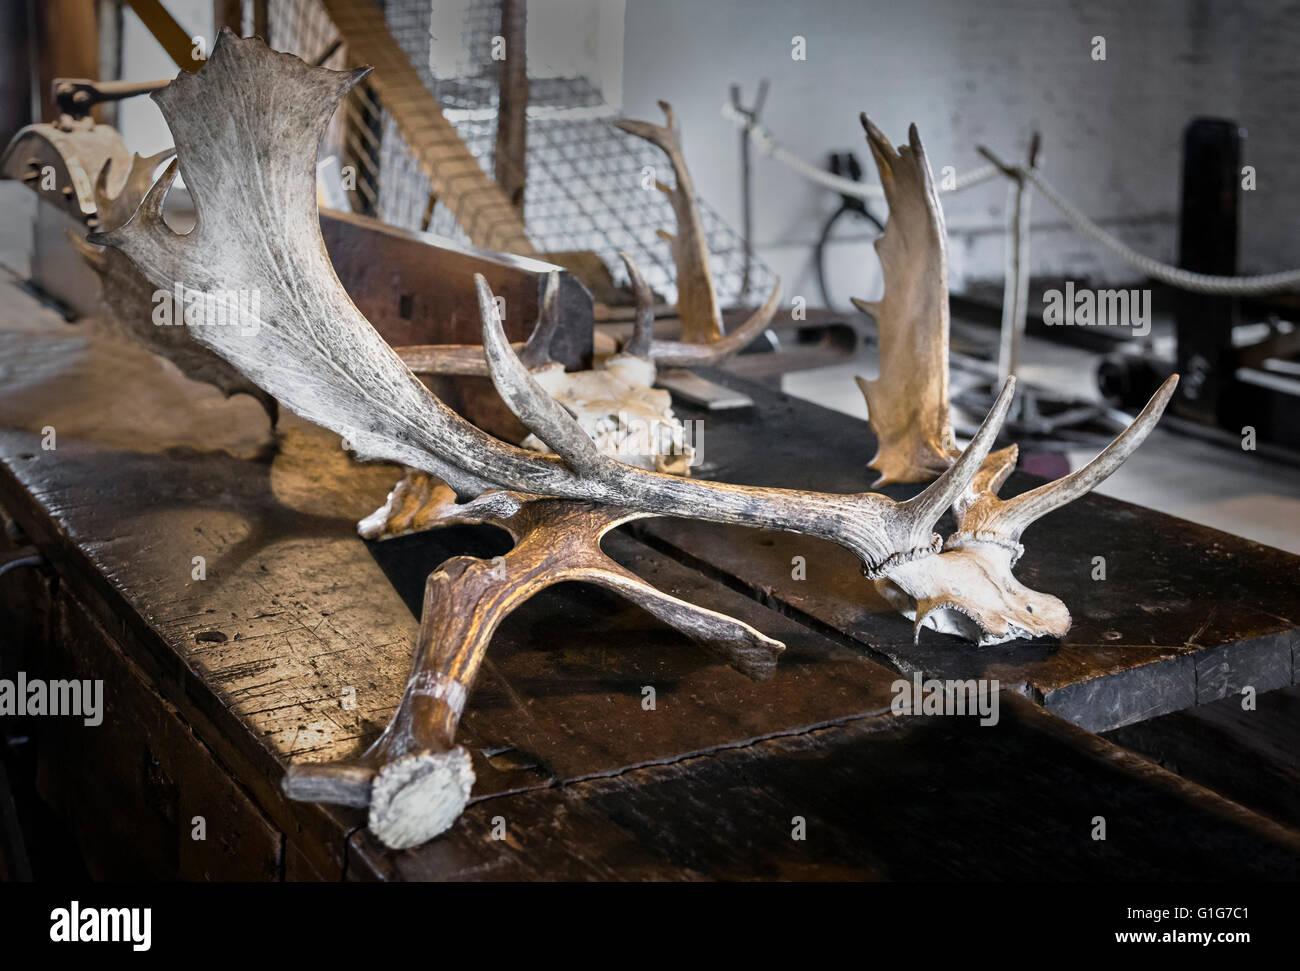 Deer horns in the mill in Dunham Massey. - Stock Image